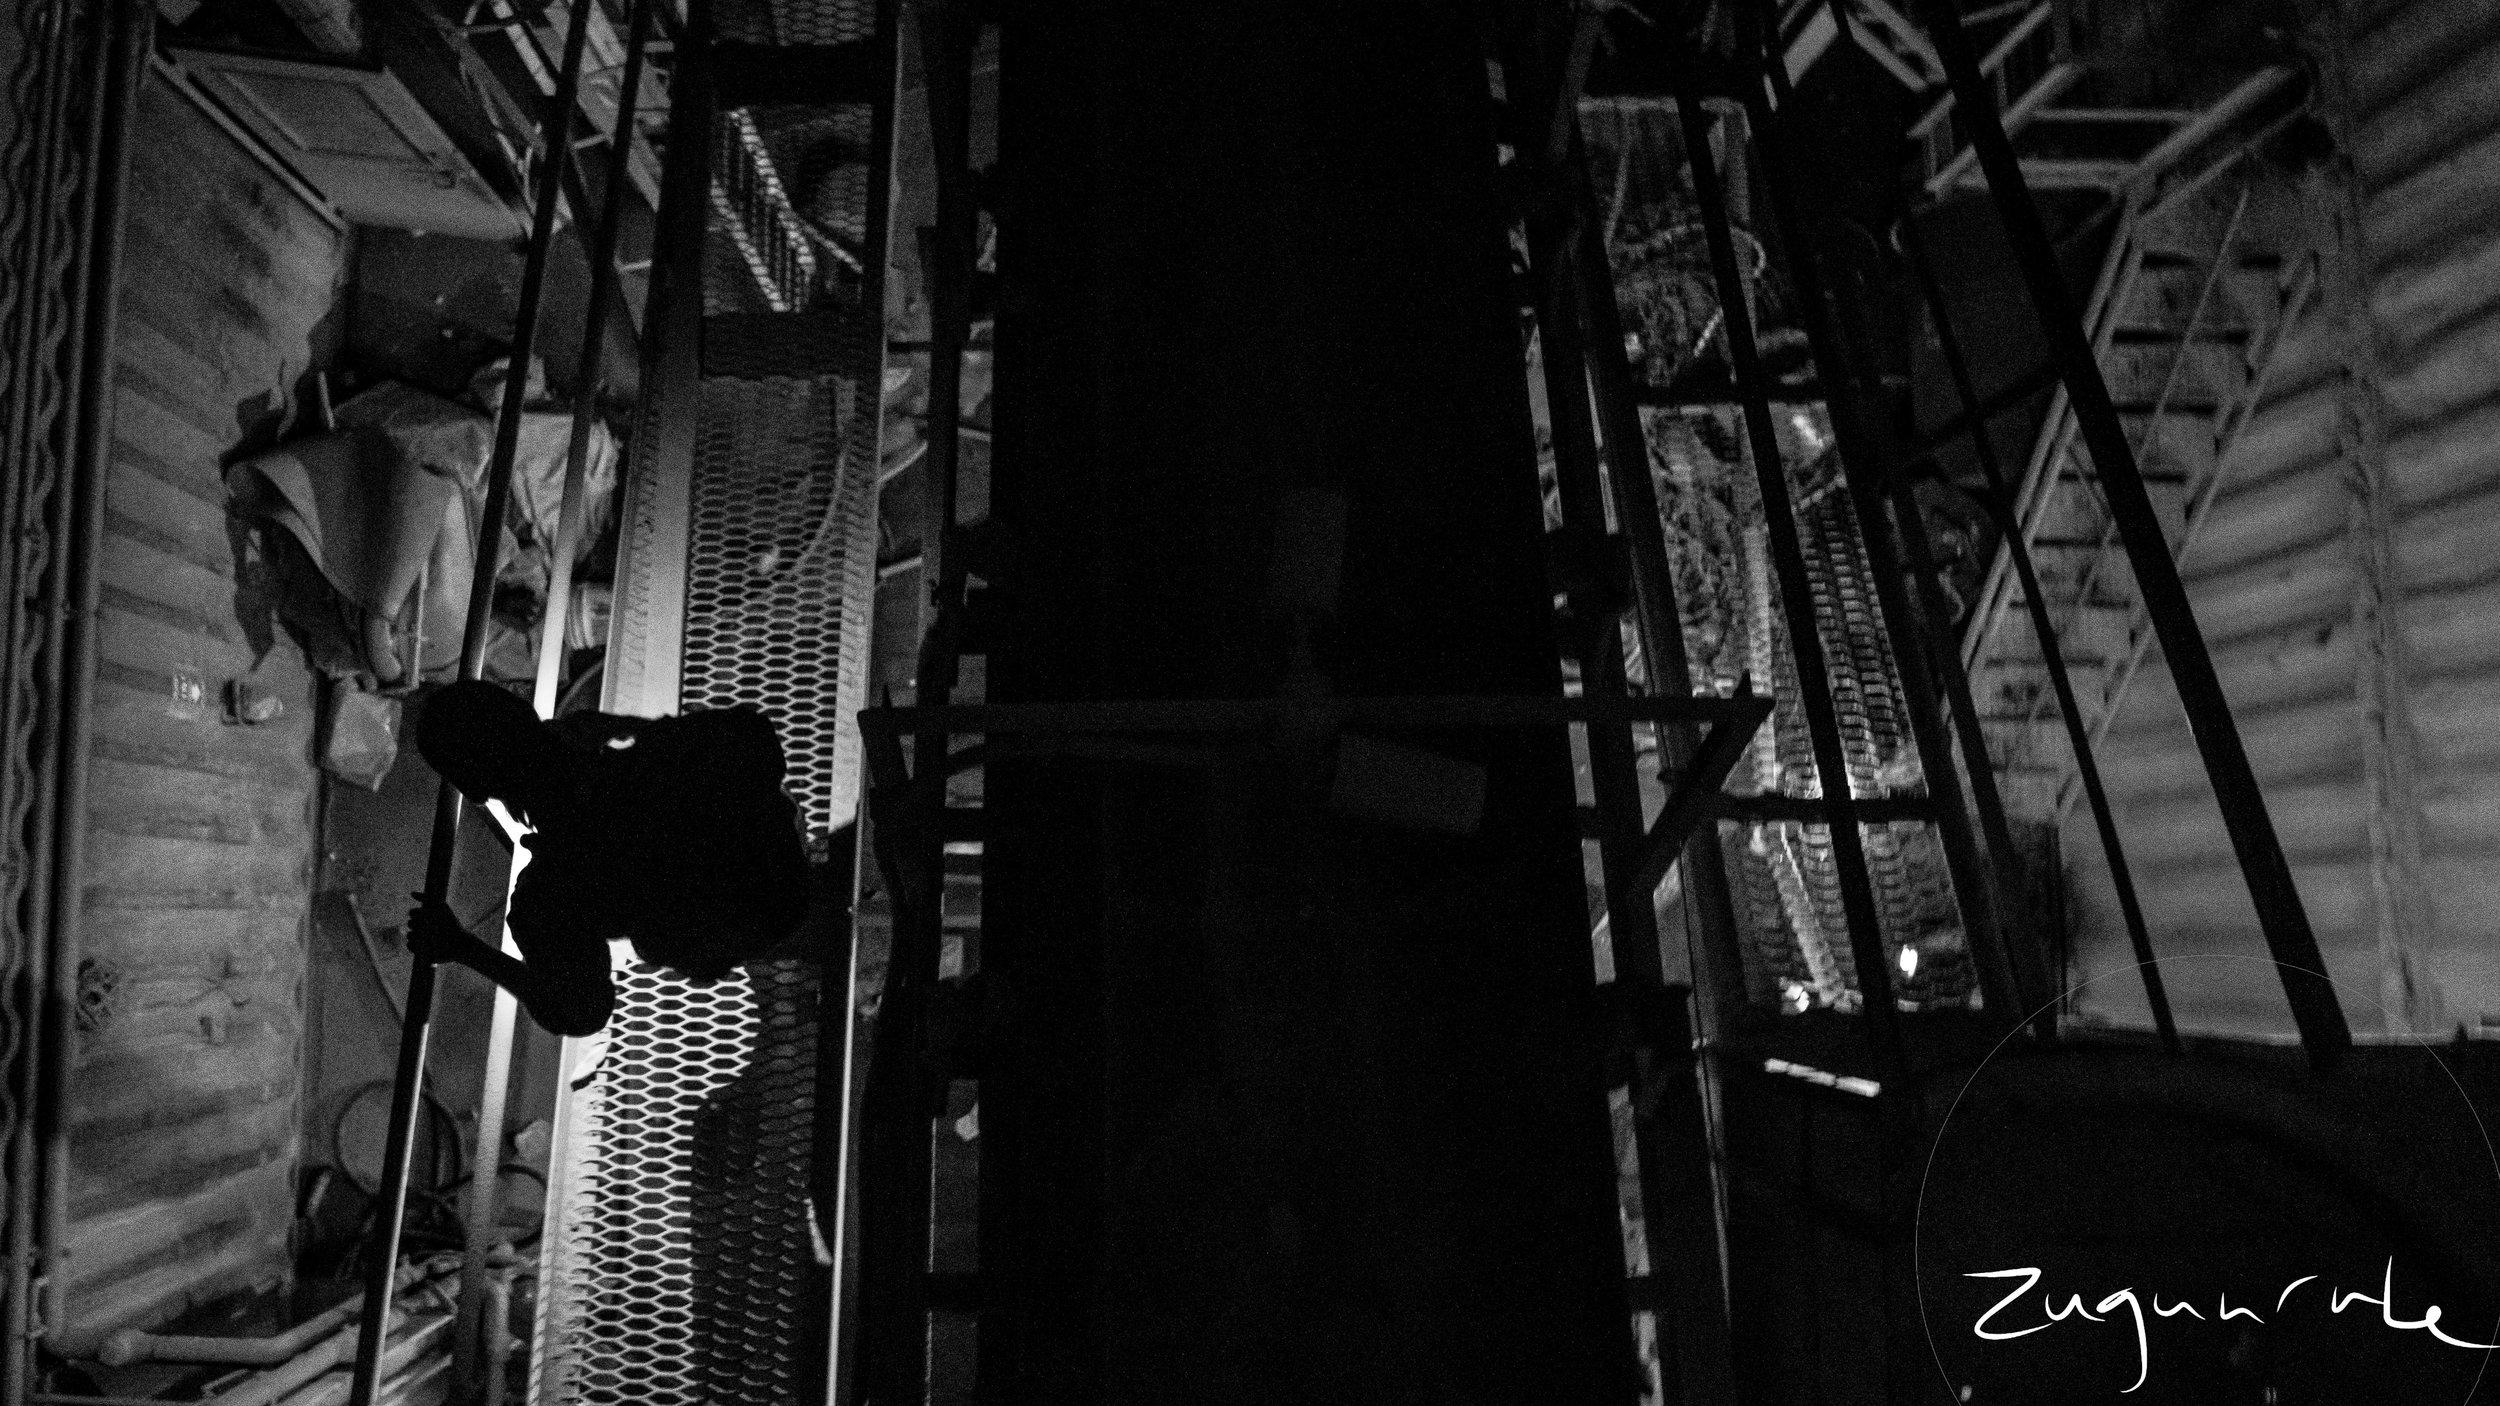 Abandoned factory in Gowanus